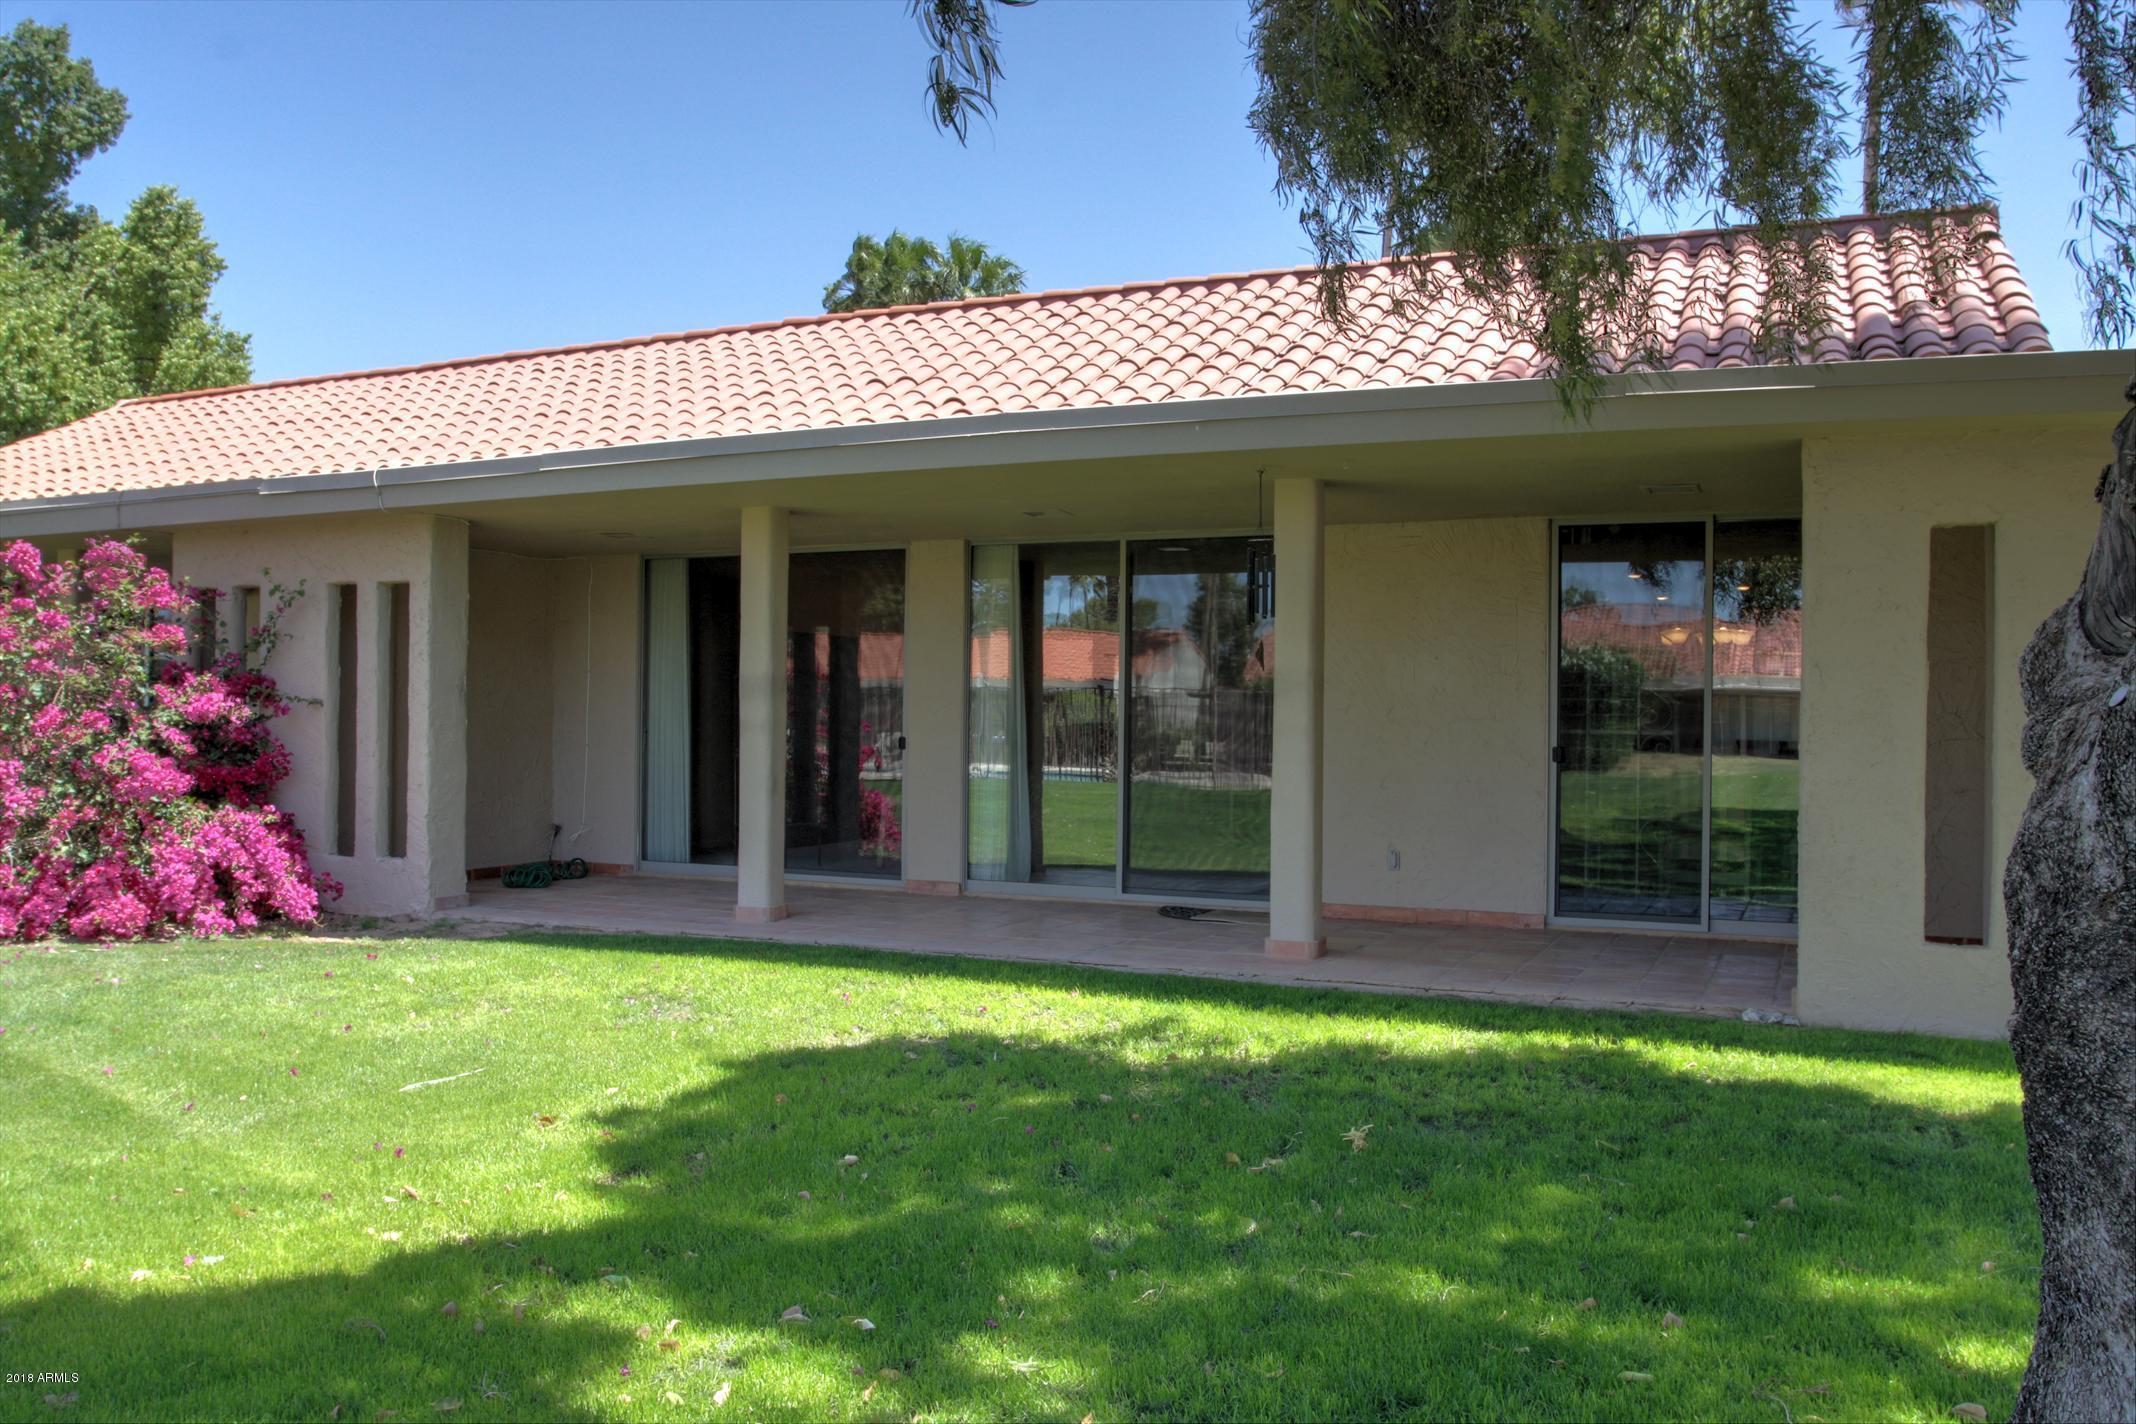 Photo of 7504 N Ajo Road, Scottsdale, AZ 85258